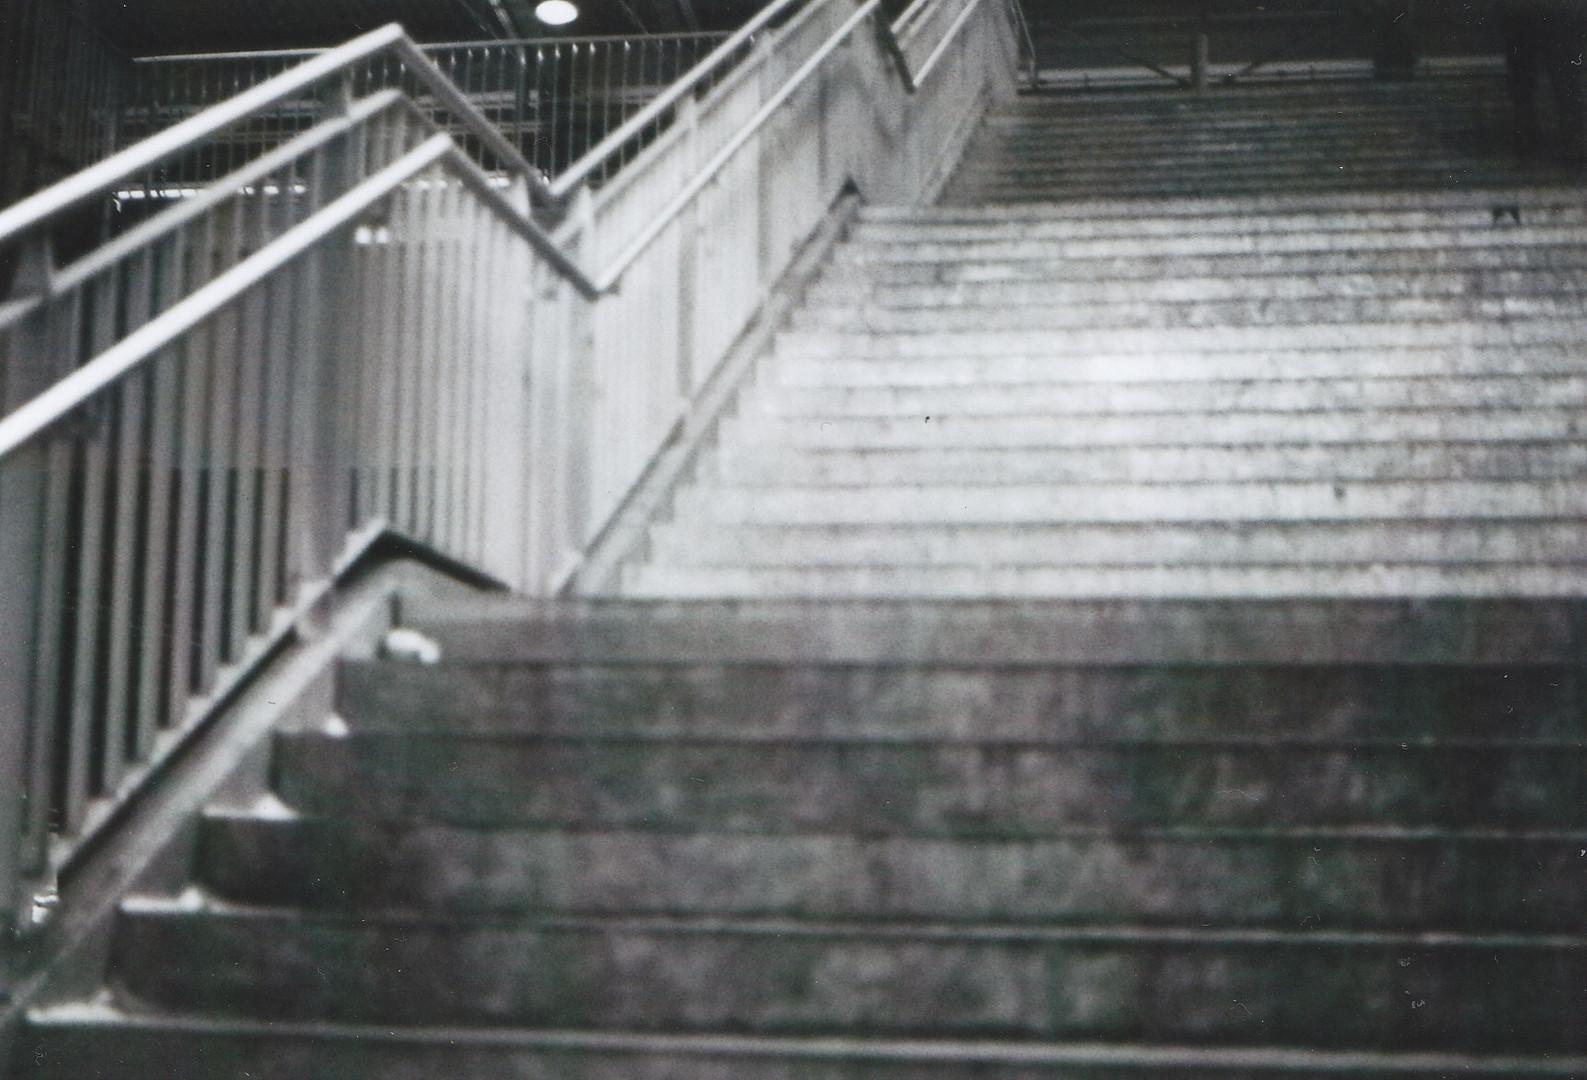 stairway to ringbahn